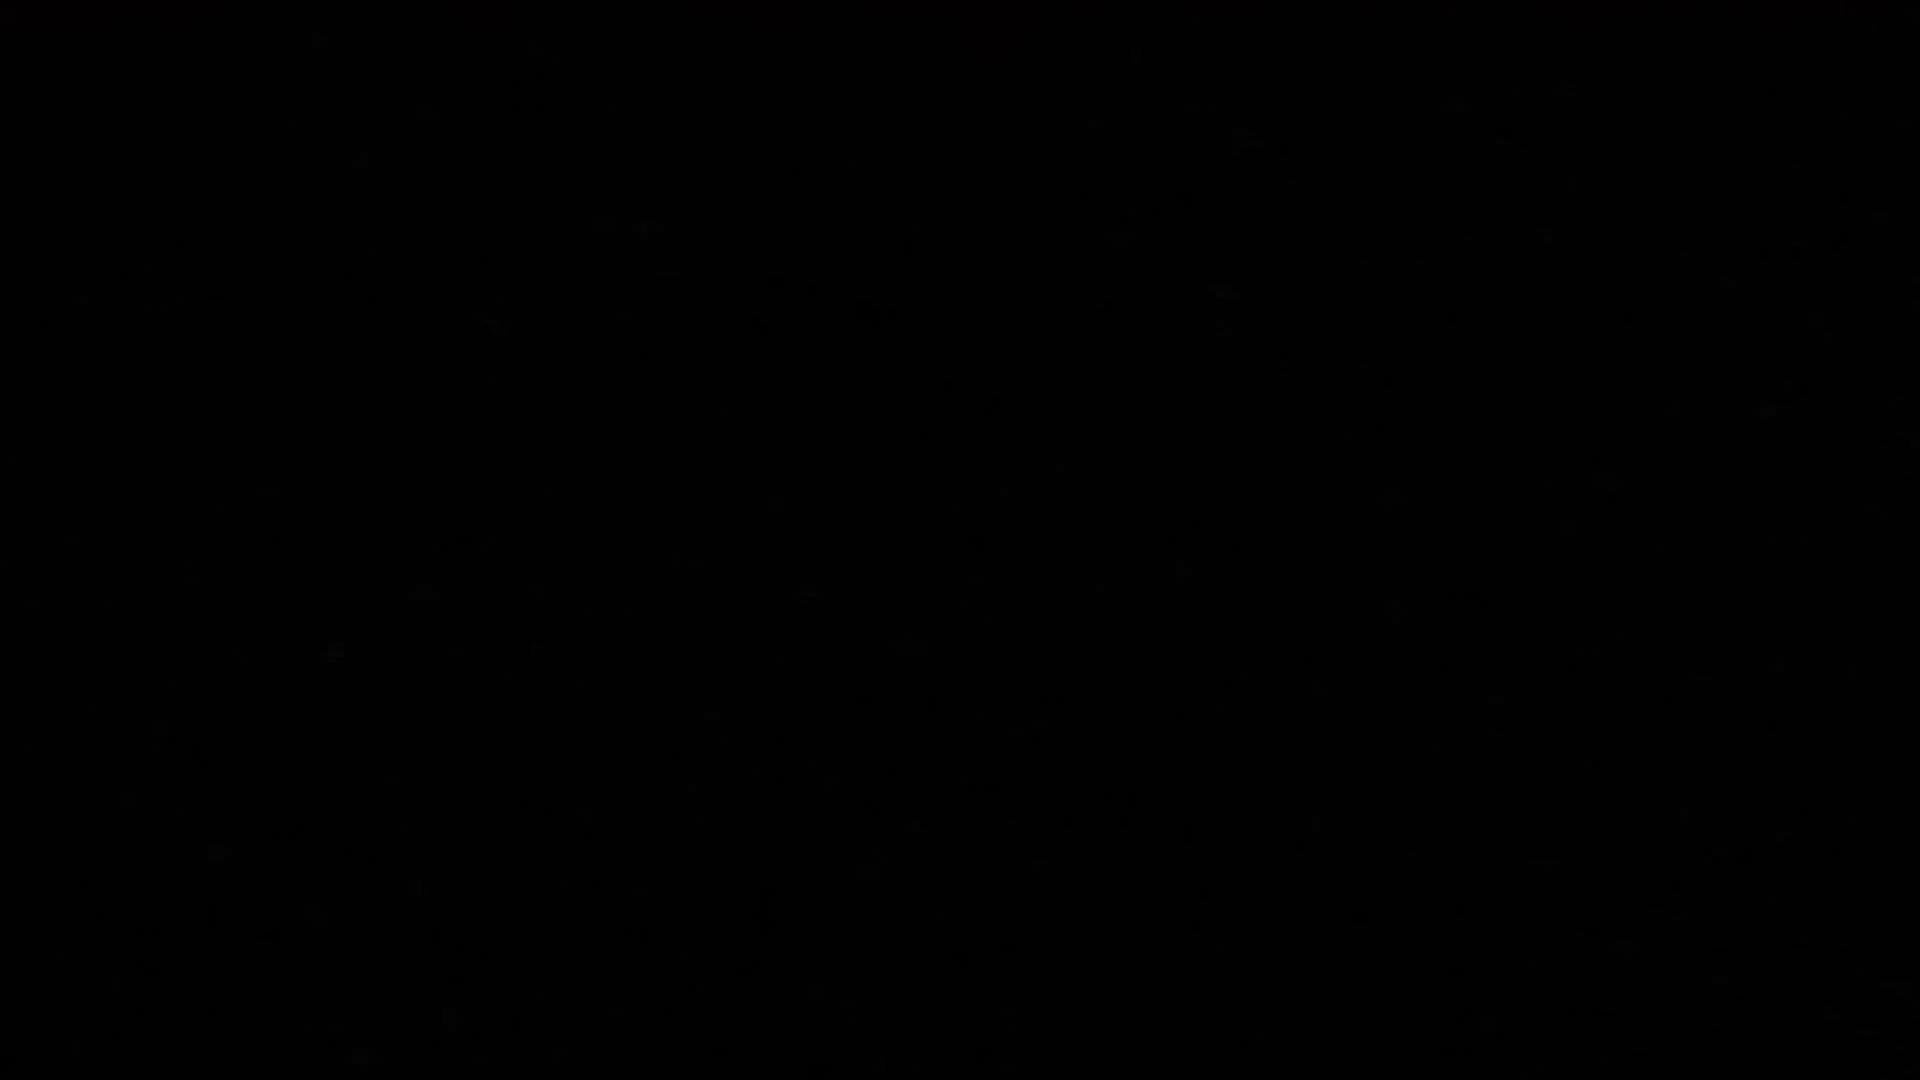 SPYさん初投稿!マンション覗き!5000K!ハイビジョン撮影VOL.05(元サッカー部員社会人) 私服 男同士動画 75連発 5